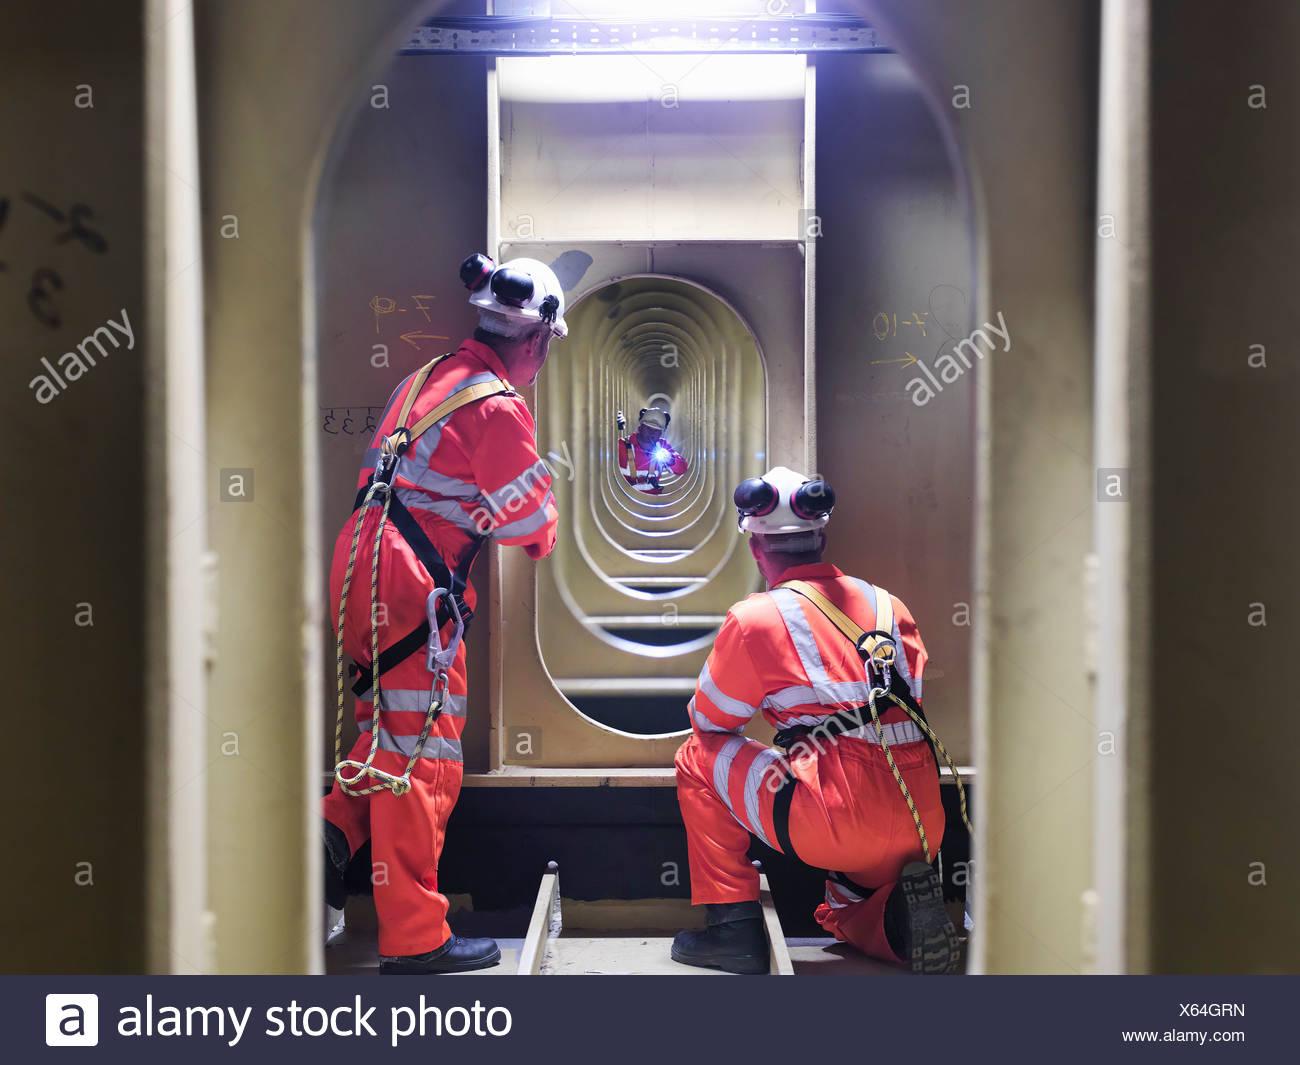 Civil engineers inspecting structure under carriageway of suspension bridge. The Humber Bridge, UK, built in 1981 - Stock Image